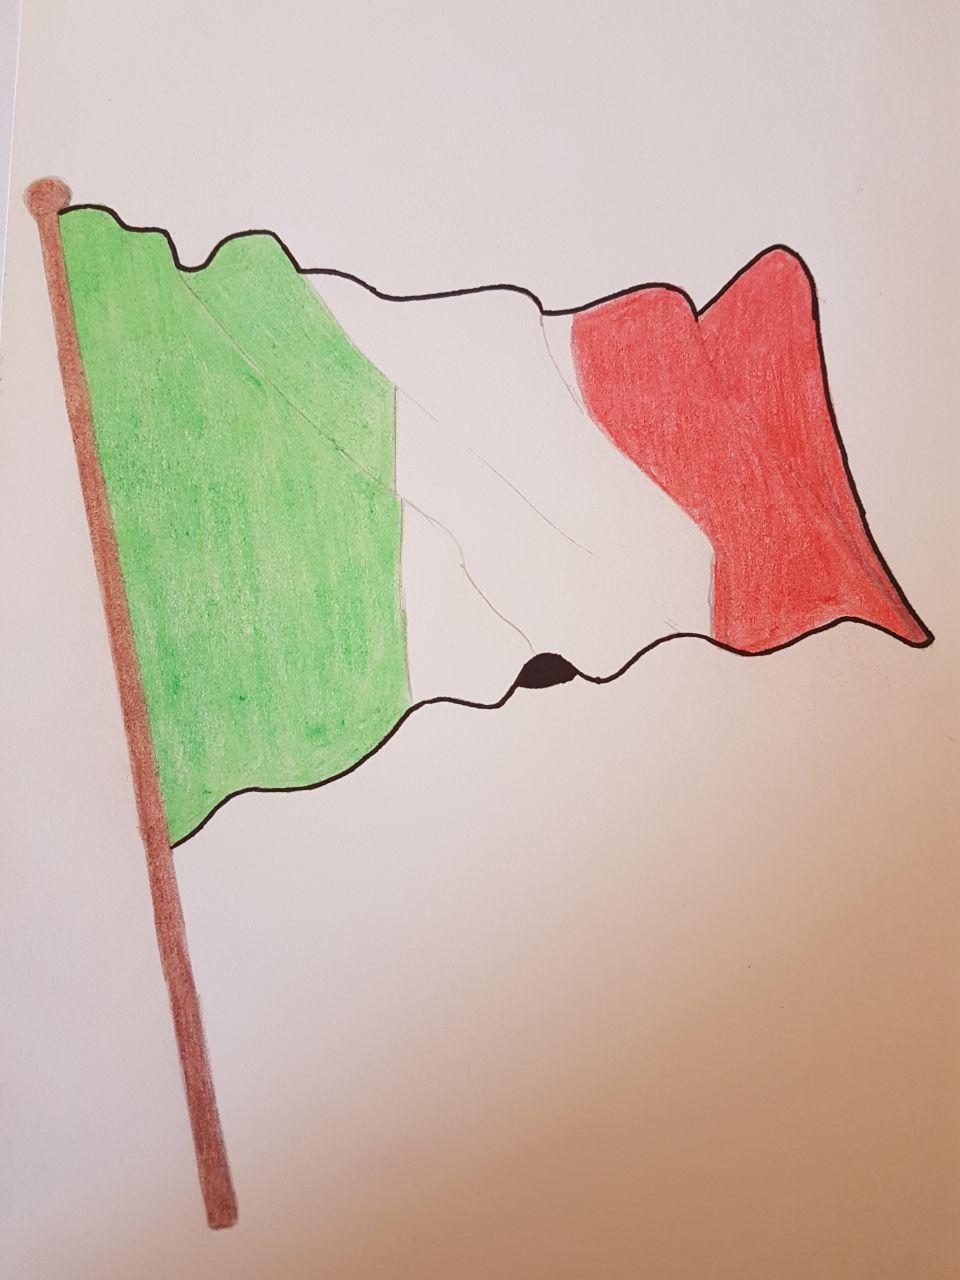 Ottocento by Gruppo IIIC - Ourboox.com